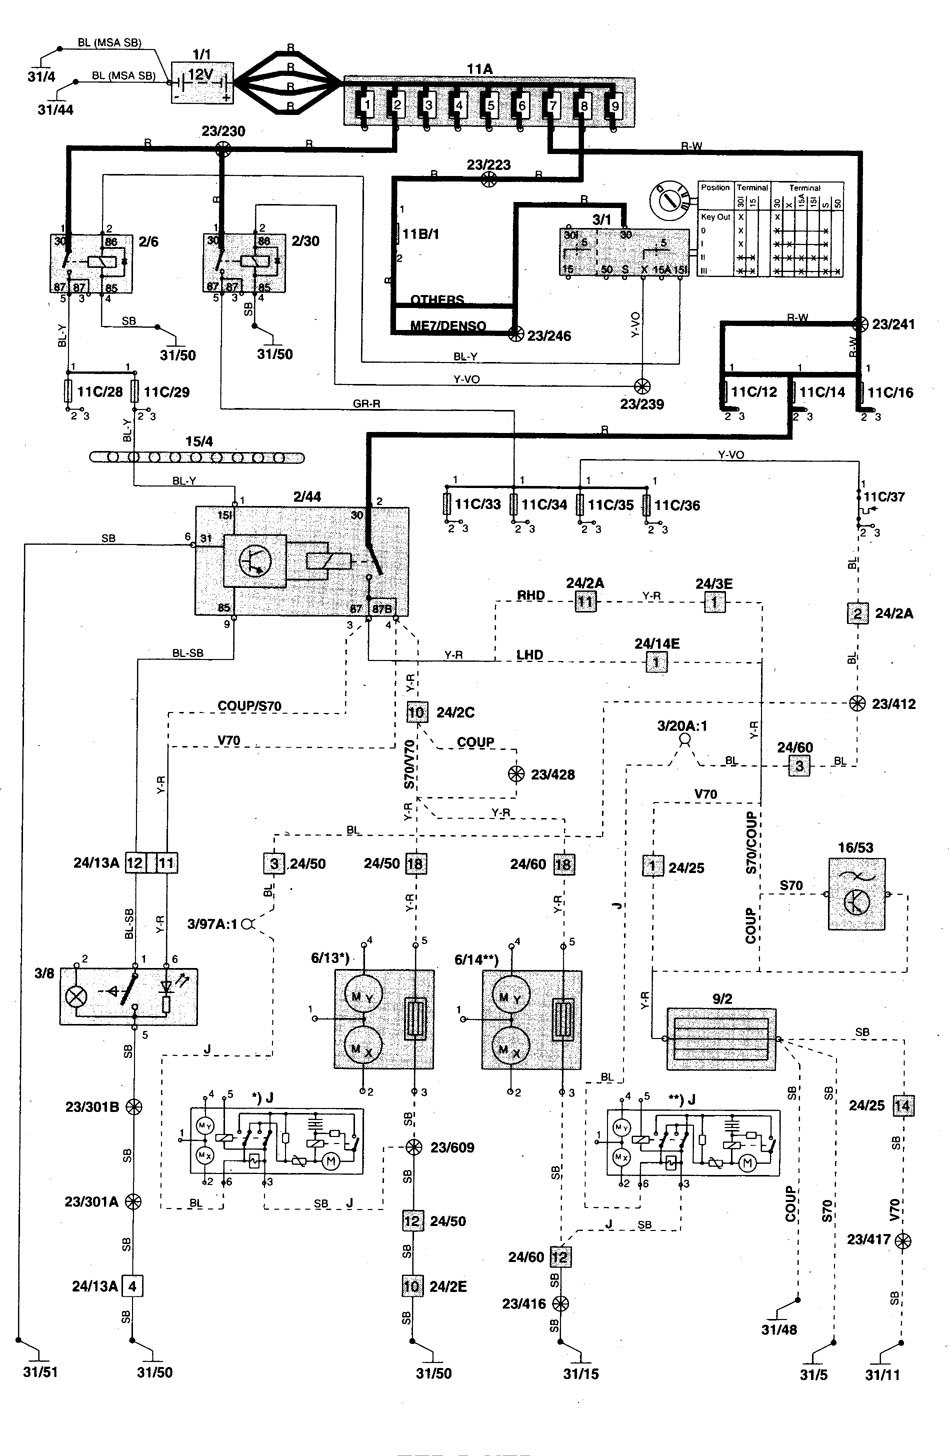 1998 Volvo S70 Dashboard Wiring Diagram | Wiring Diagram on mercedes e320 wiring diagram, dodge omni wiring diagram, volvo 850 shop manual, volvo 850 suspension, porsche cayenne wiring diagram, saturn aura wiring diagram, volkswagen golf wiring diagram, bmw e90 wiring diagram, pontiac trans sport wiring diagram, mitsubishi starion wiring diagram, chevrolet hhr wiring diagram, volvo amazon wiring diagram, honda ascot wiring diagram, chevrolet volt wiring diagram, volvo ignition wiring diagram, chrysler crossfire wiring diagram, mercury milan wiring diagram, volvo 850 water pump, geo storm wiring diagram, volkswagen cabrio wiring diagram,